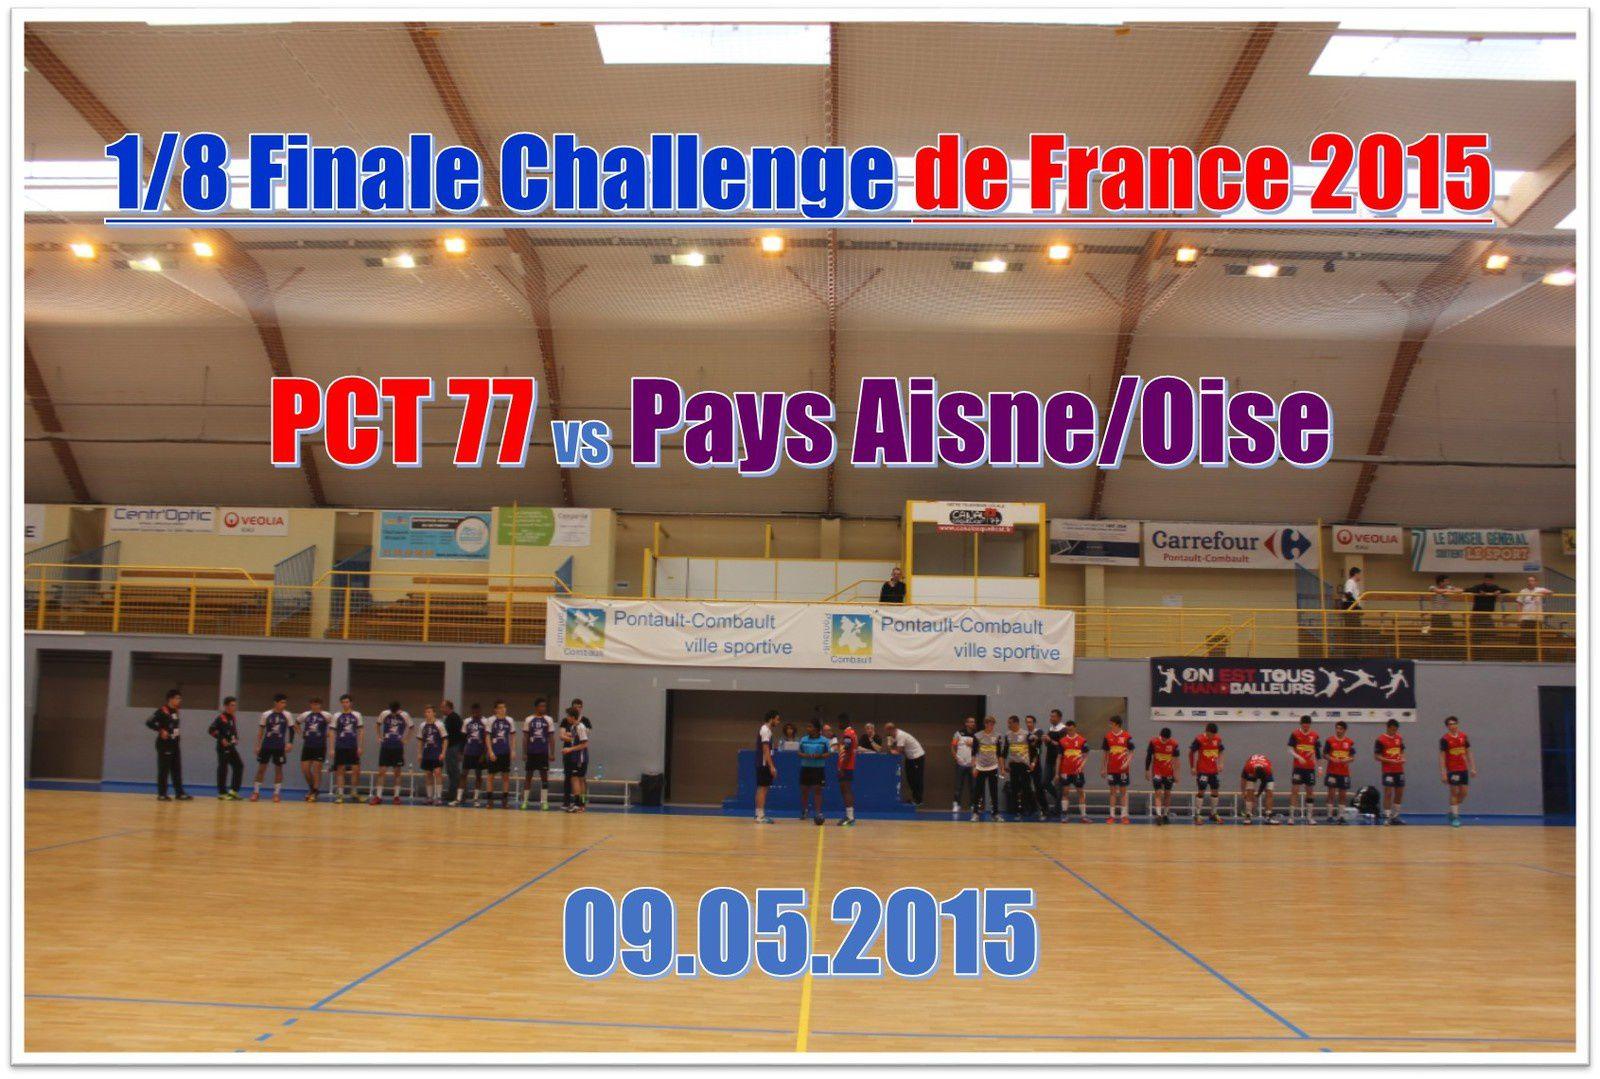 Tour Final CdF 2015 - Entente PAO vs PCT 77 (09.05.2015) 1/2